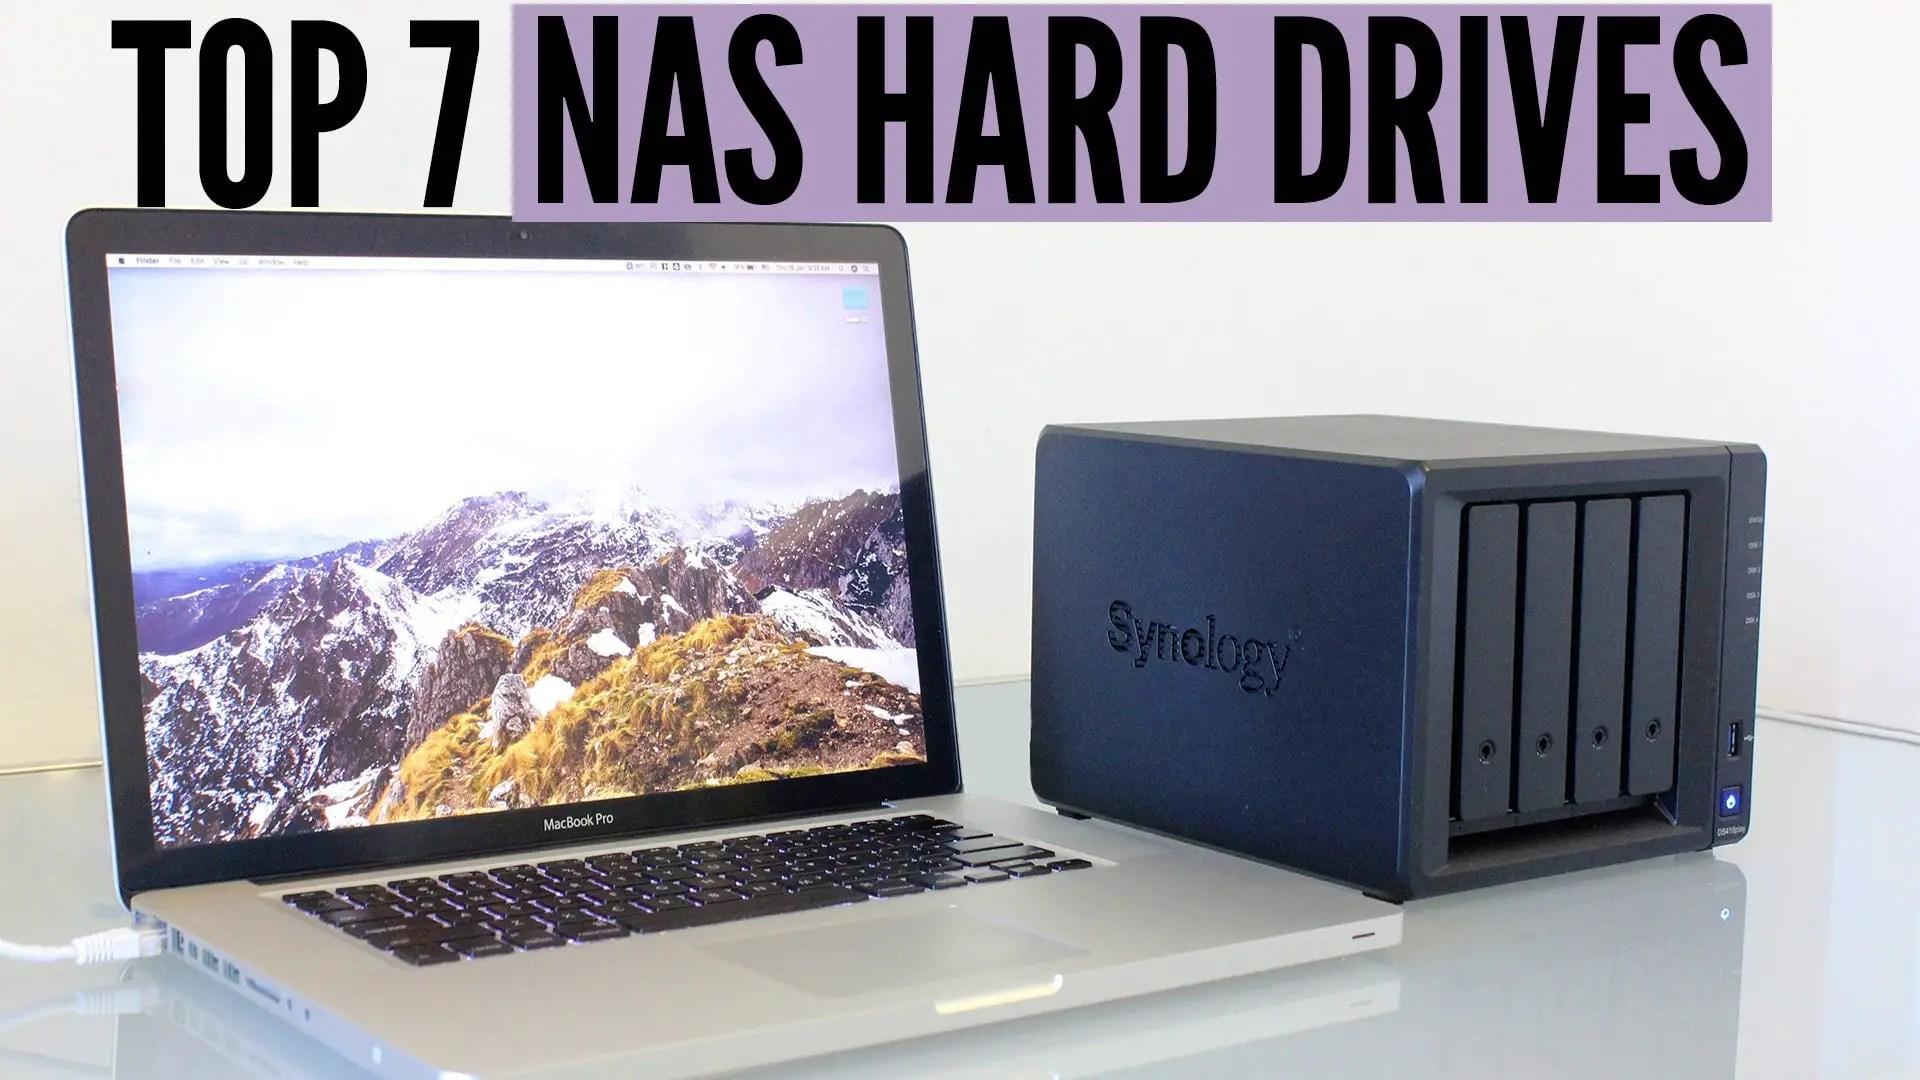 best nas hard drives